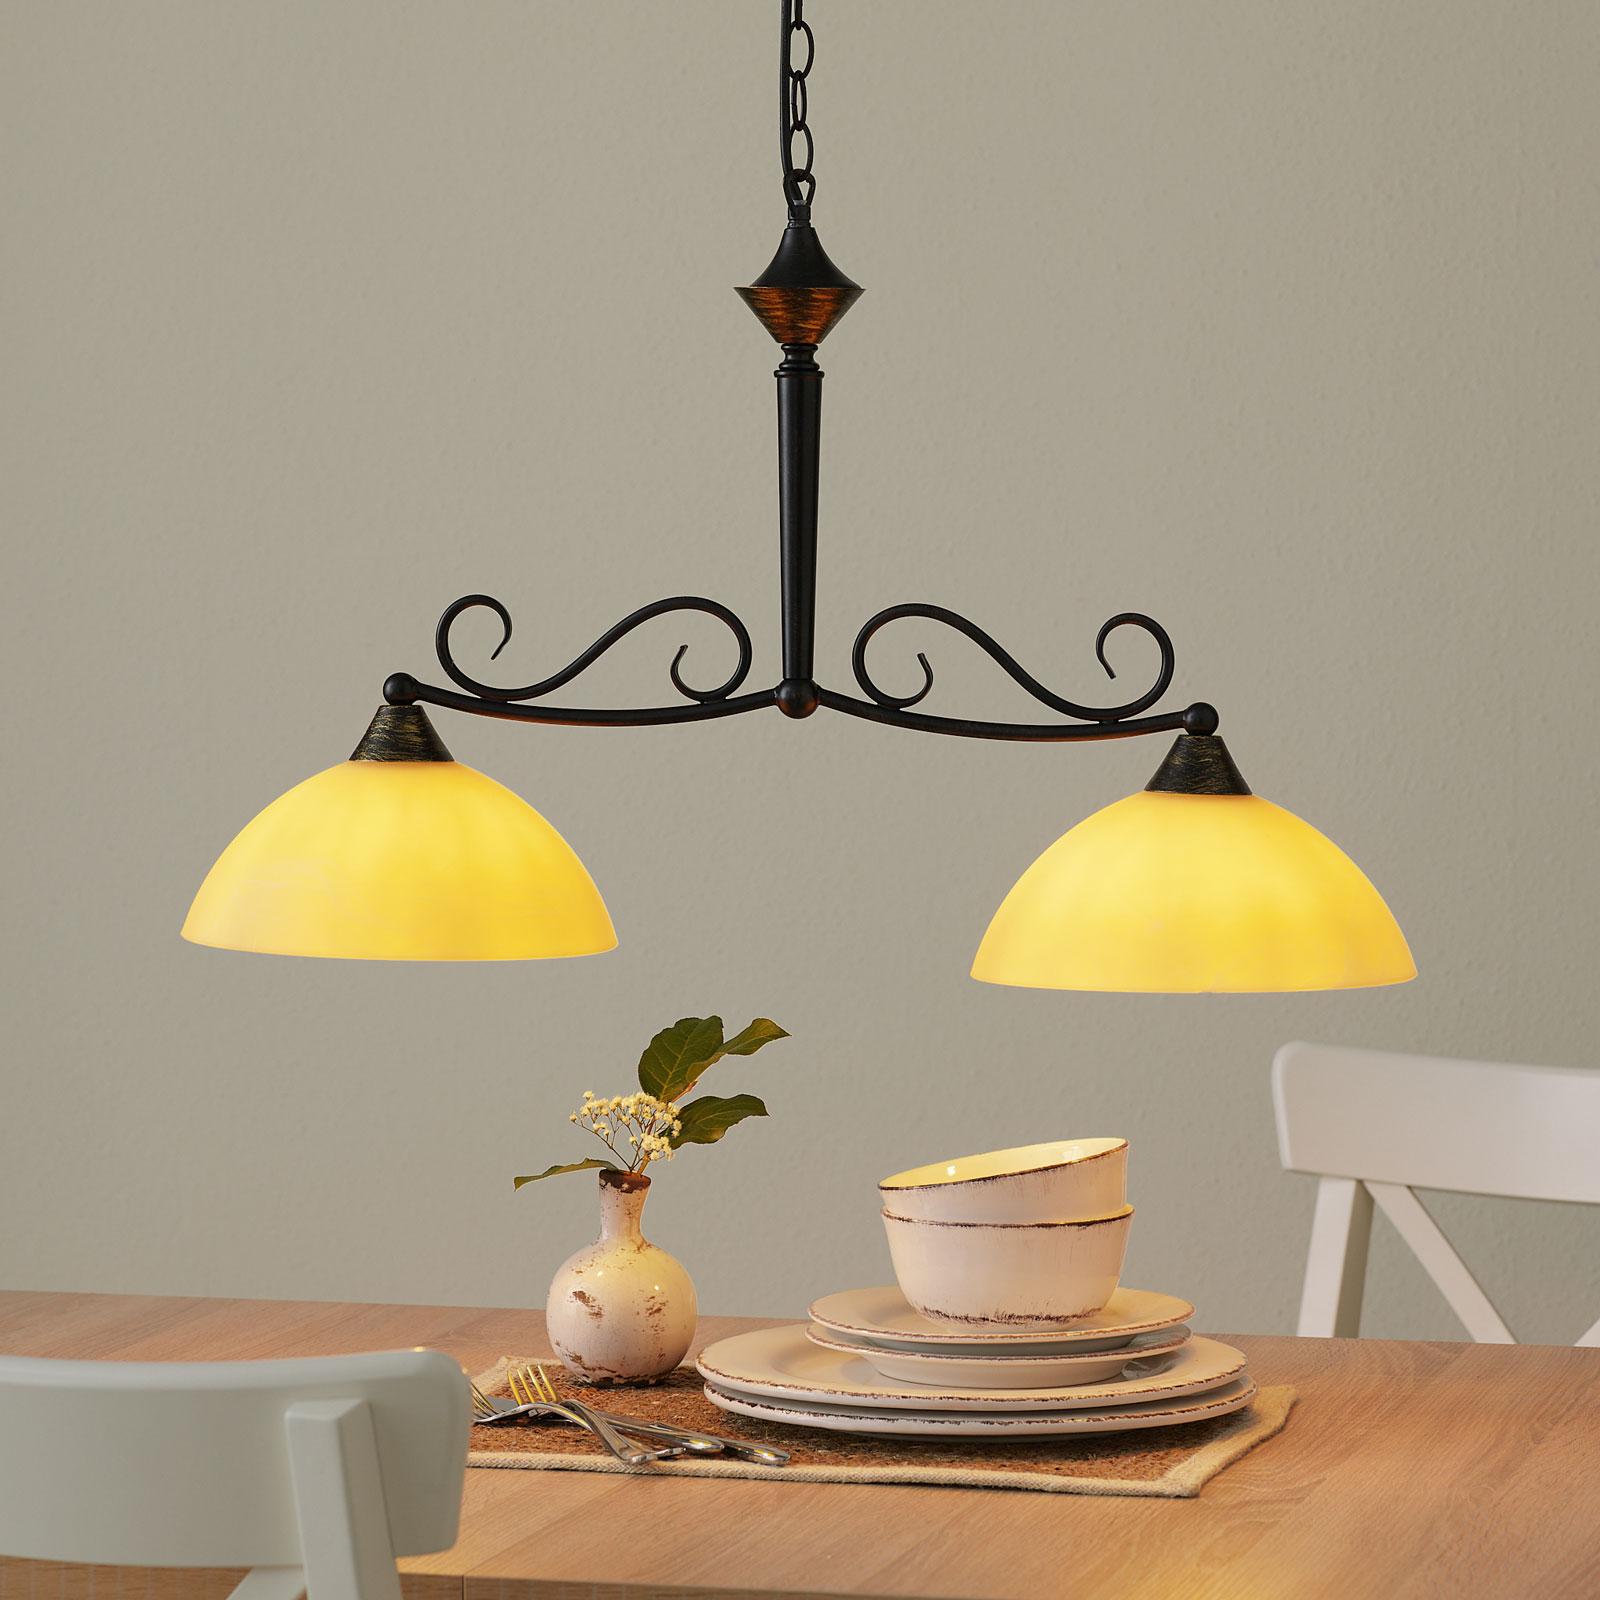 Balk hanglamp Allemagne van glas, 2-lamps